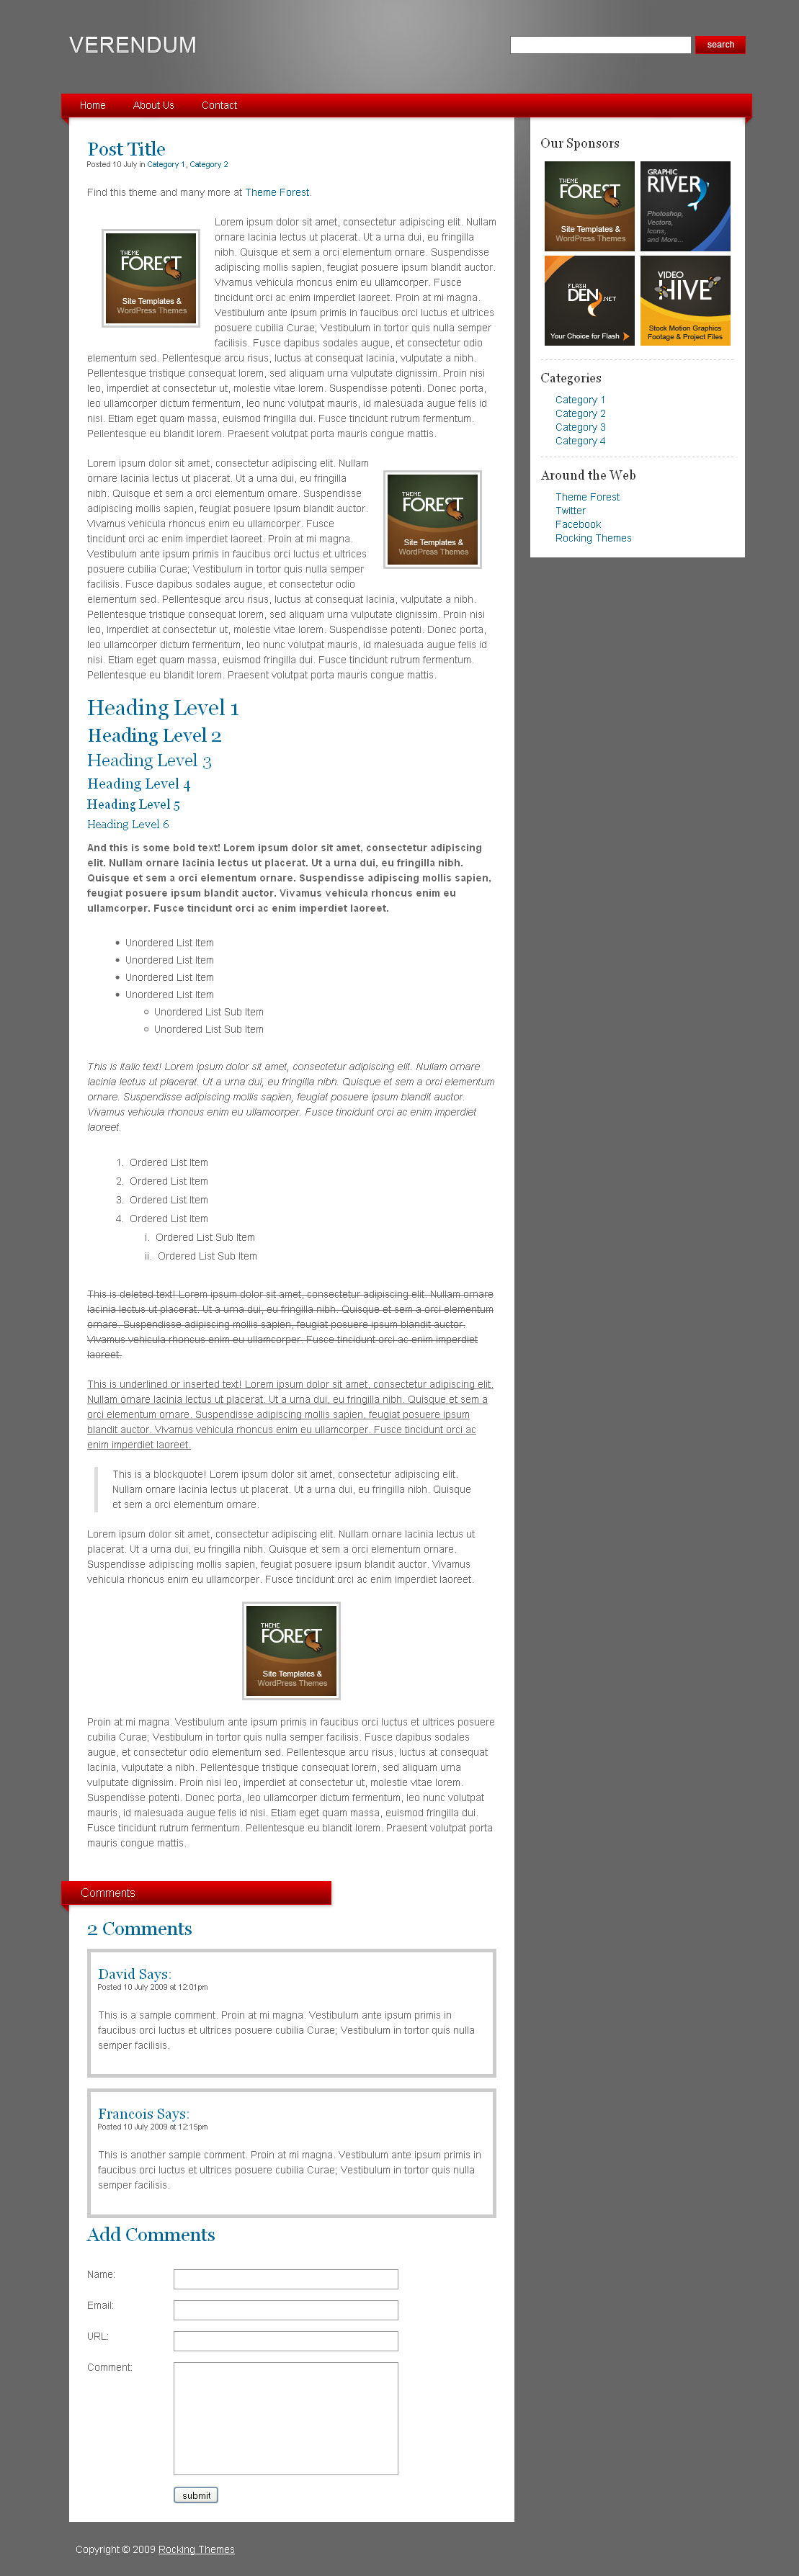 Verendum HTML Business Portfolio - Verendum HTML Business Theme - Post Page